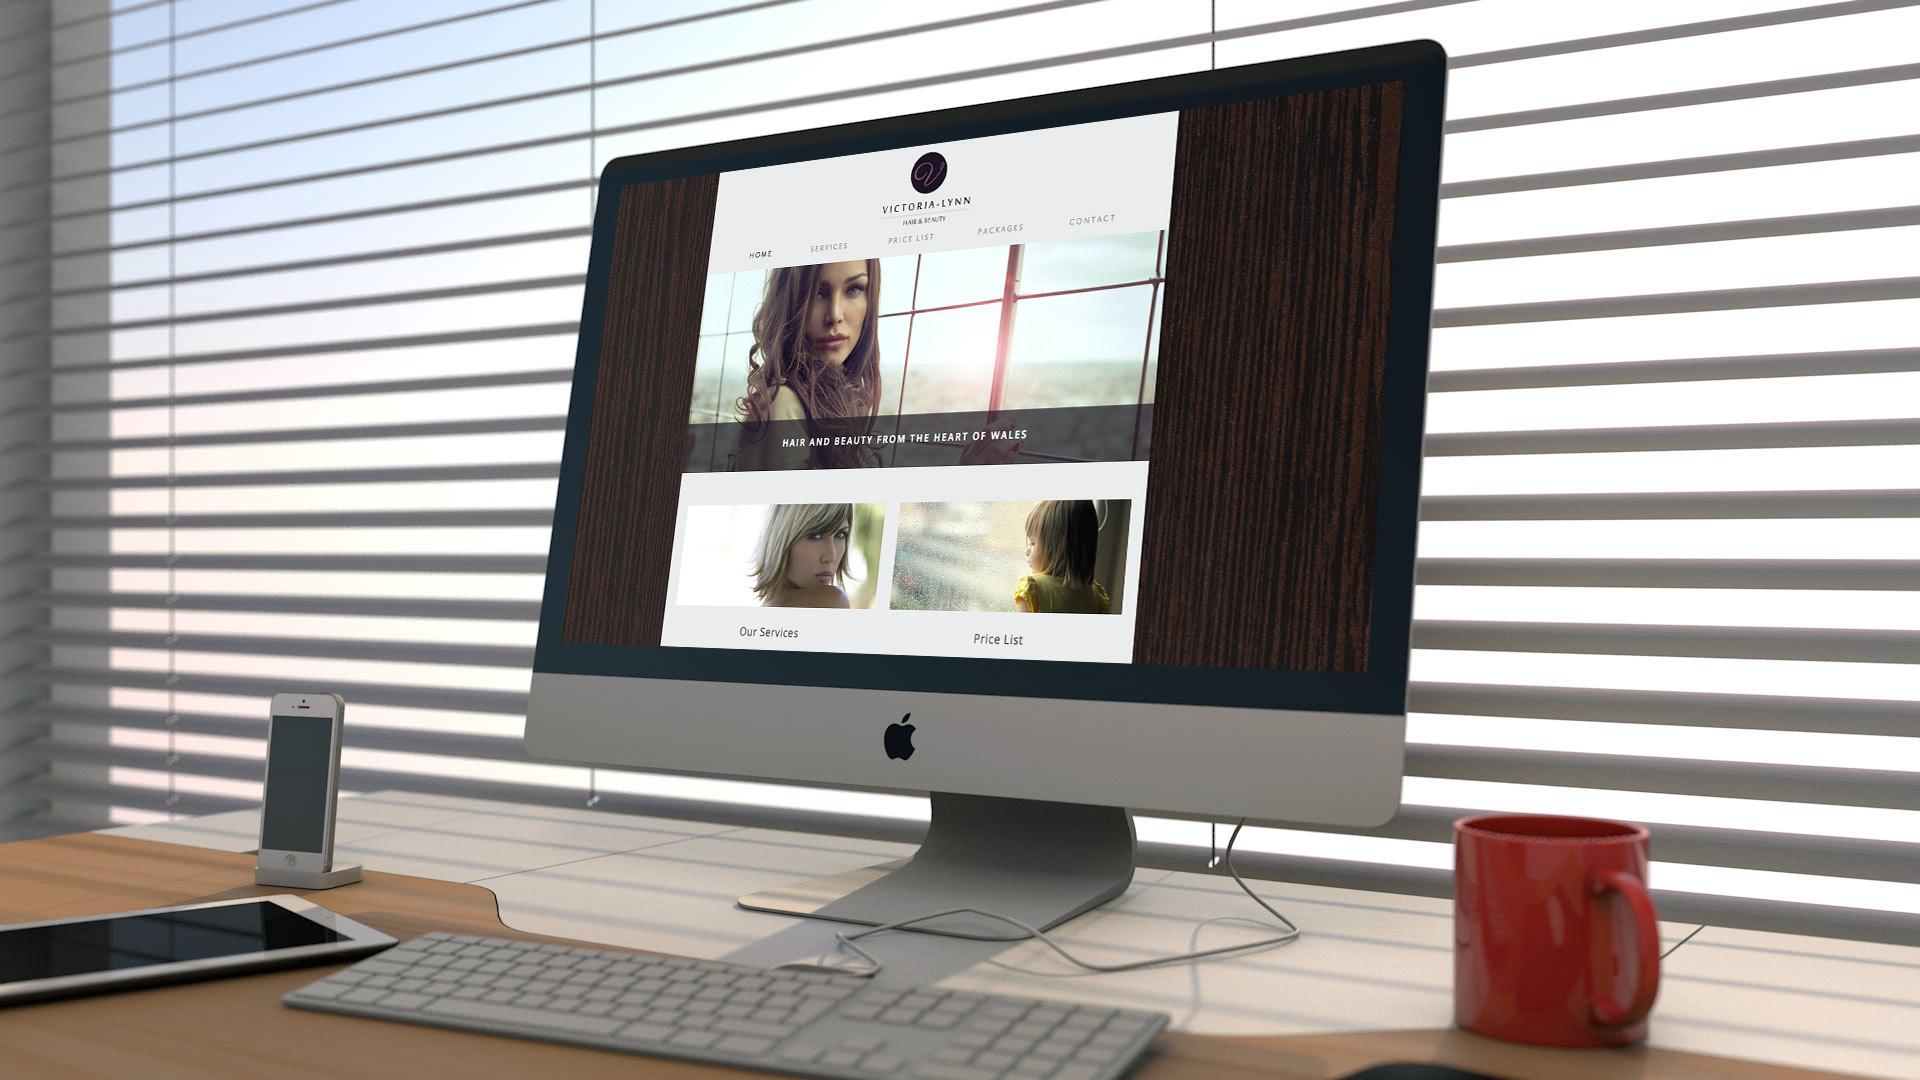 victoria-lynn-desktop-screen.jpg